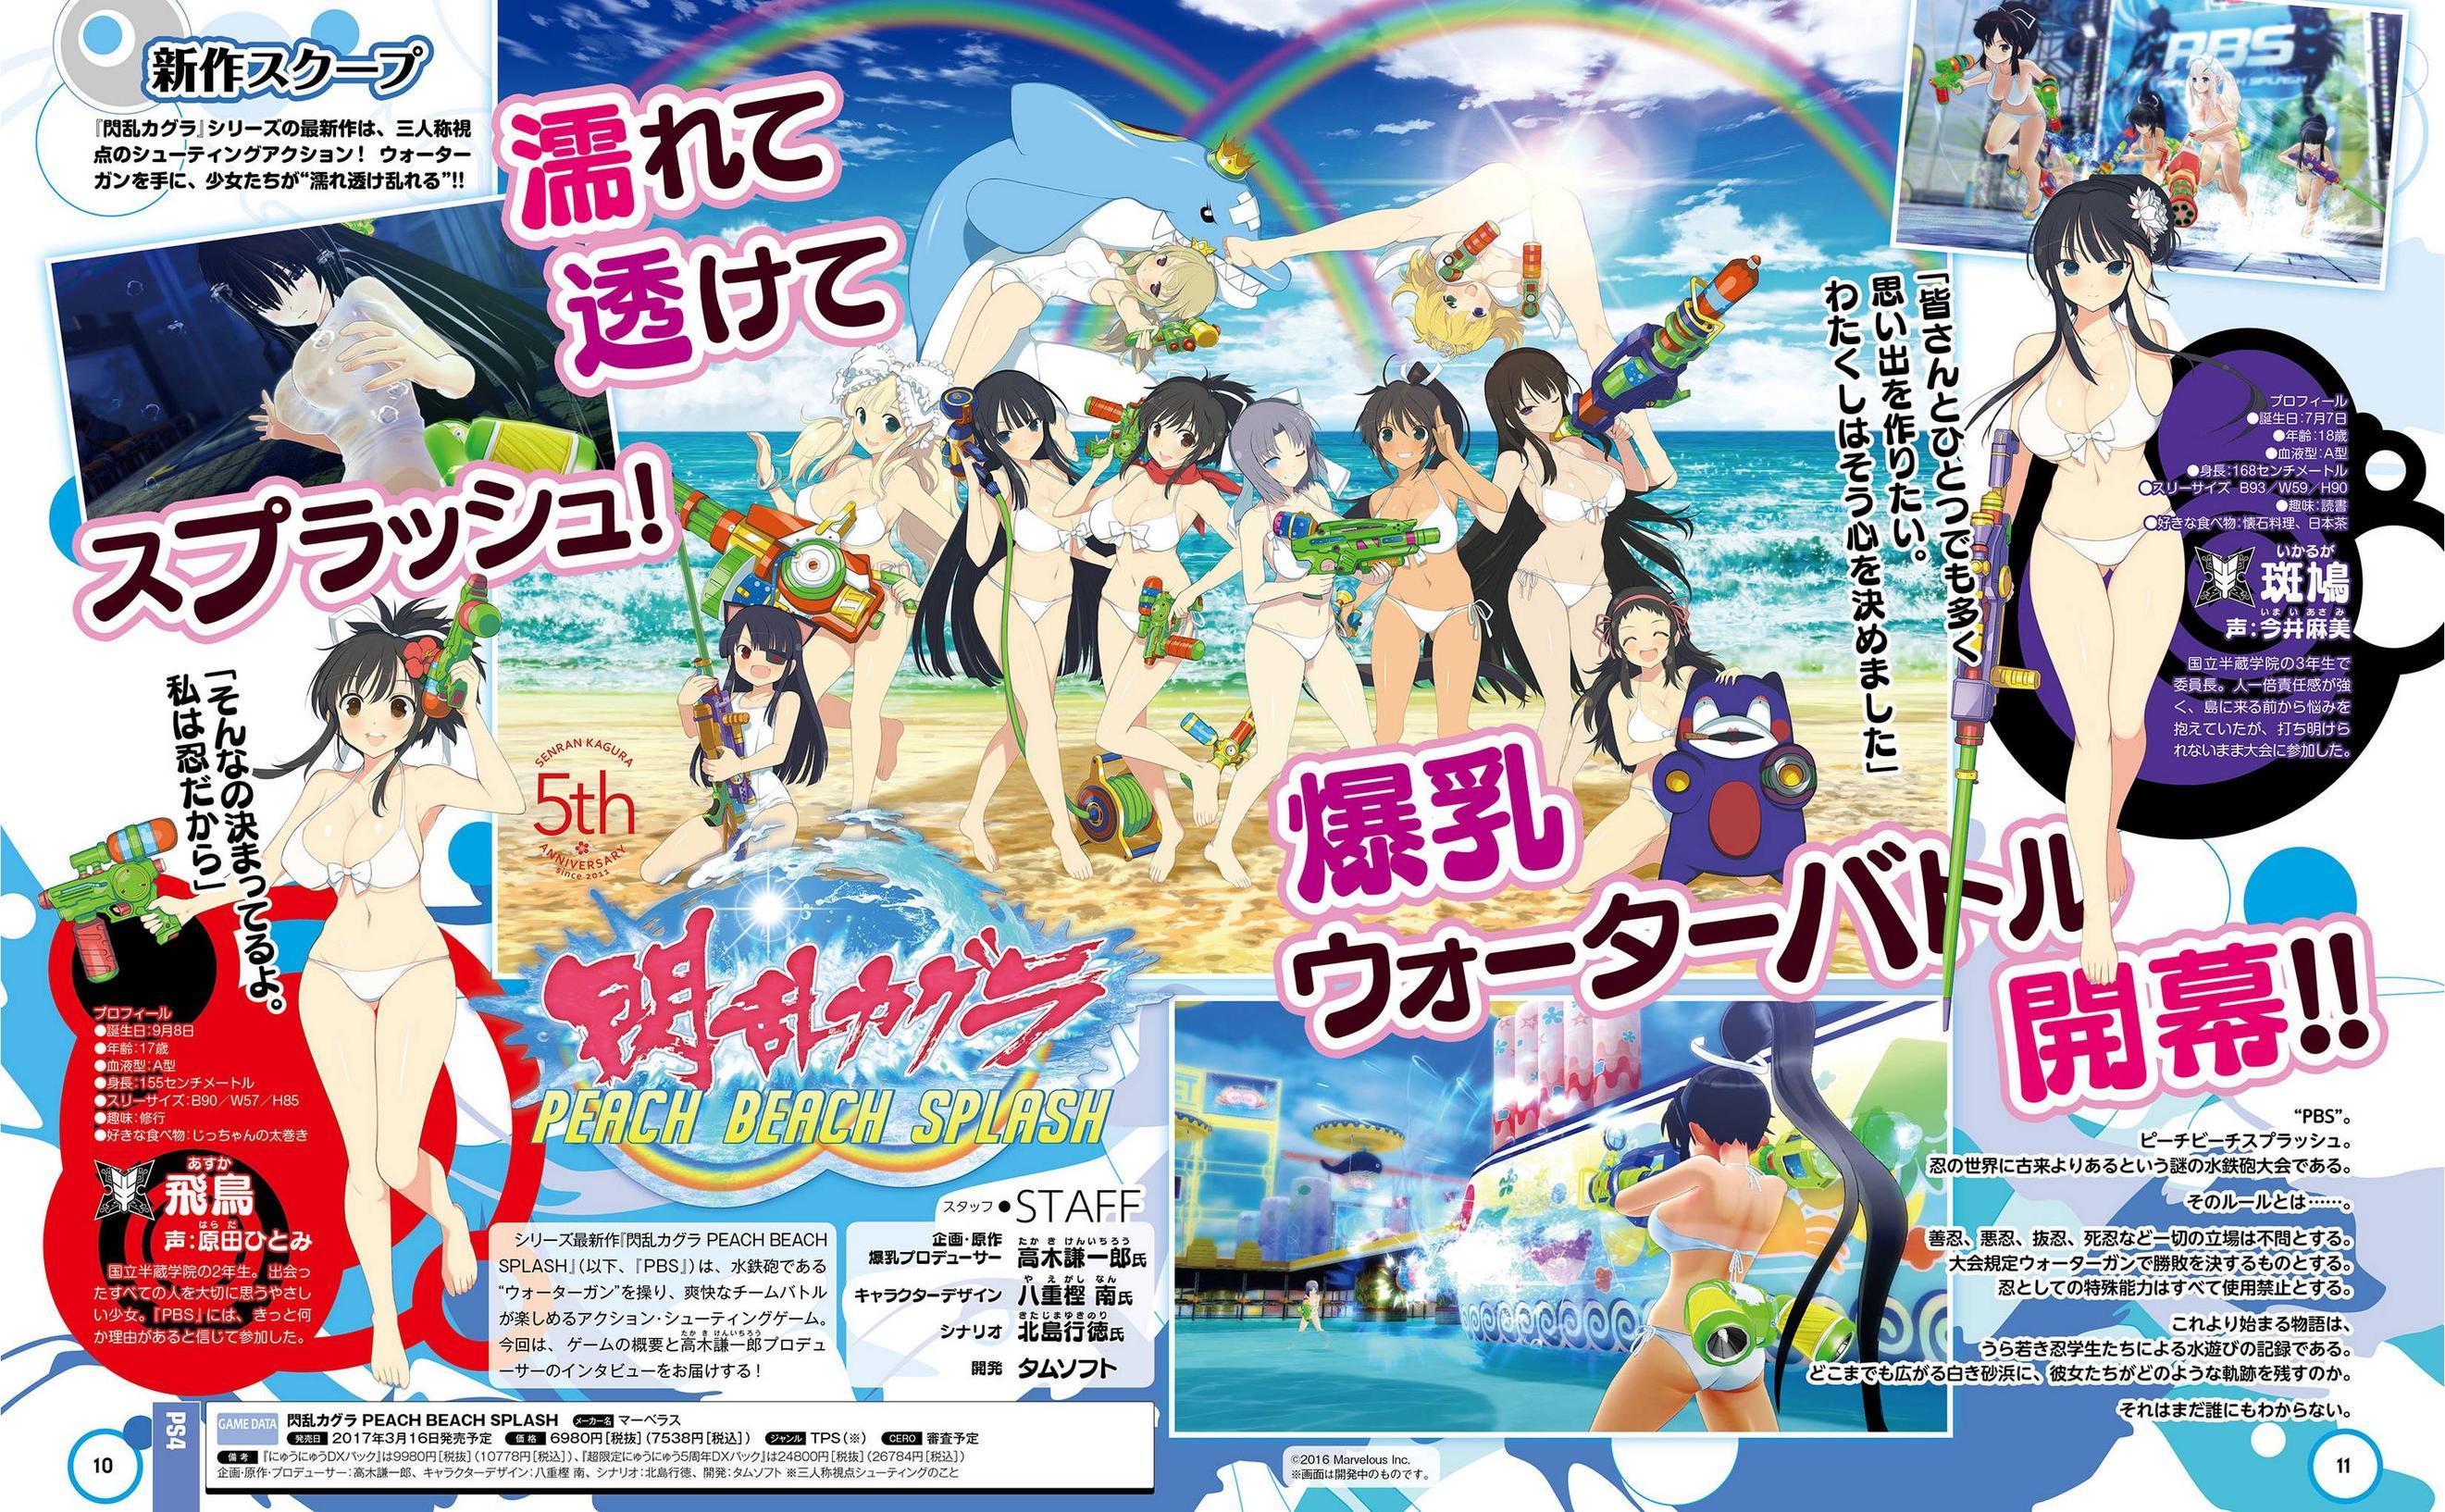 © Marvelous Games/Famitsu